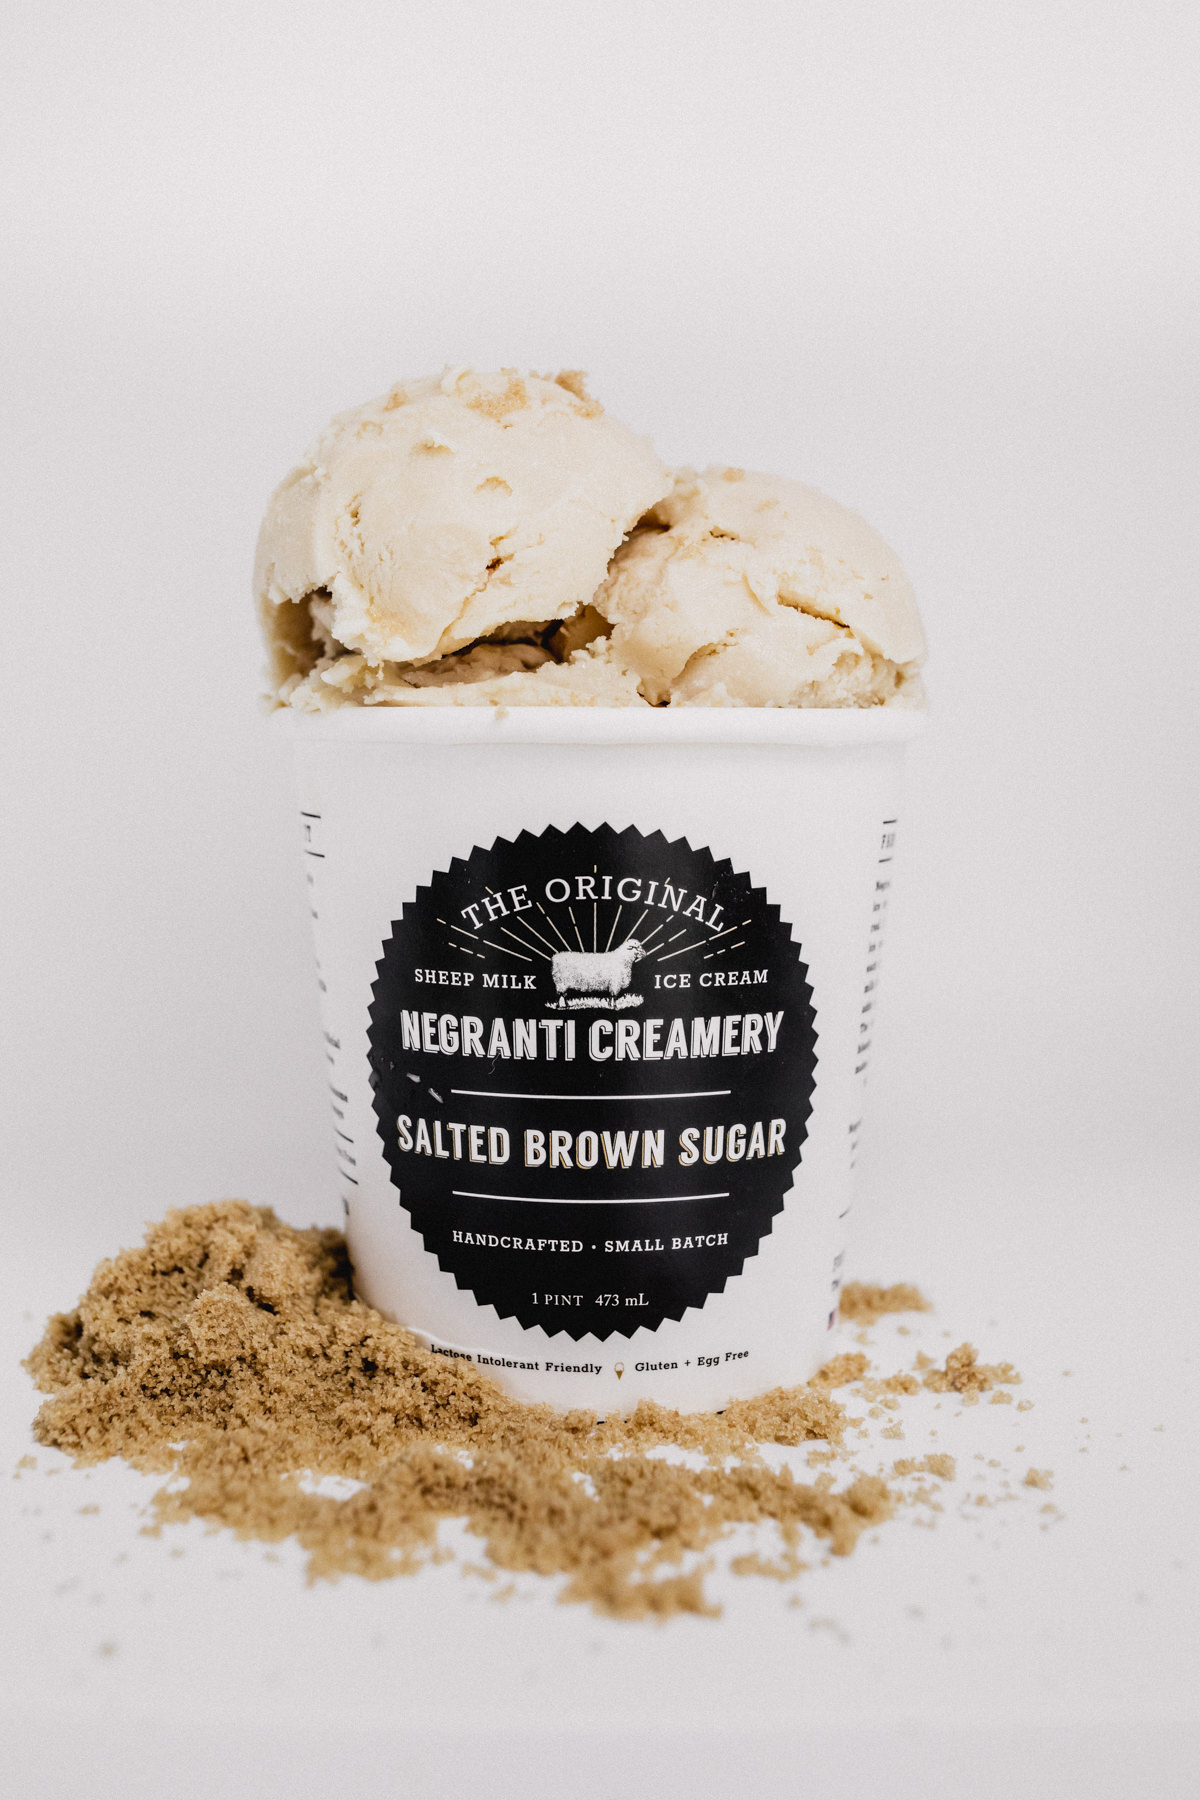 Product-Photography-Negranti-Creamery-Paso-Robles-California-805-Media-12.jpg